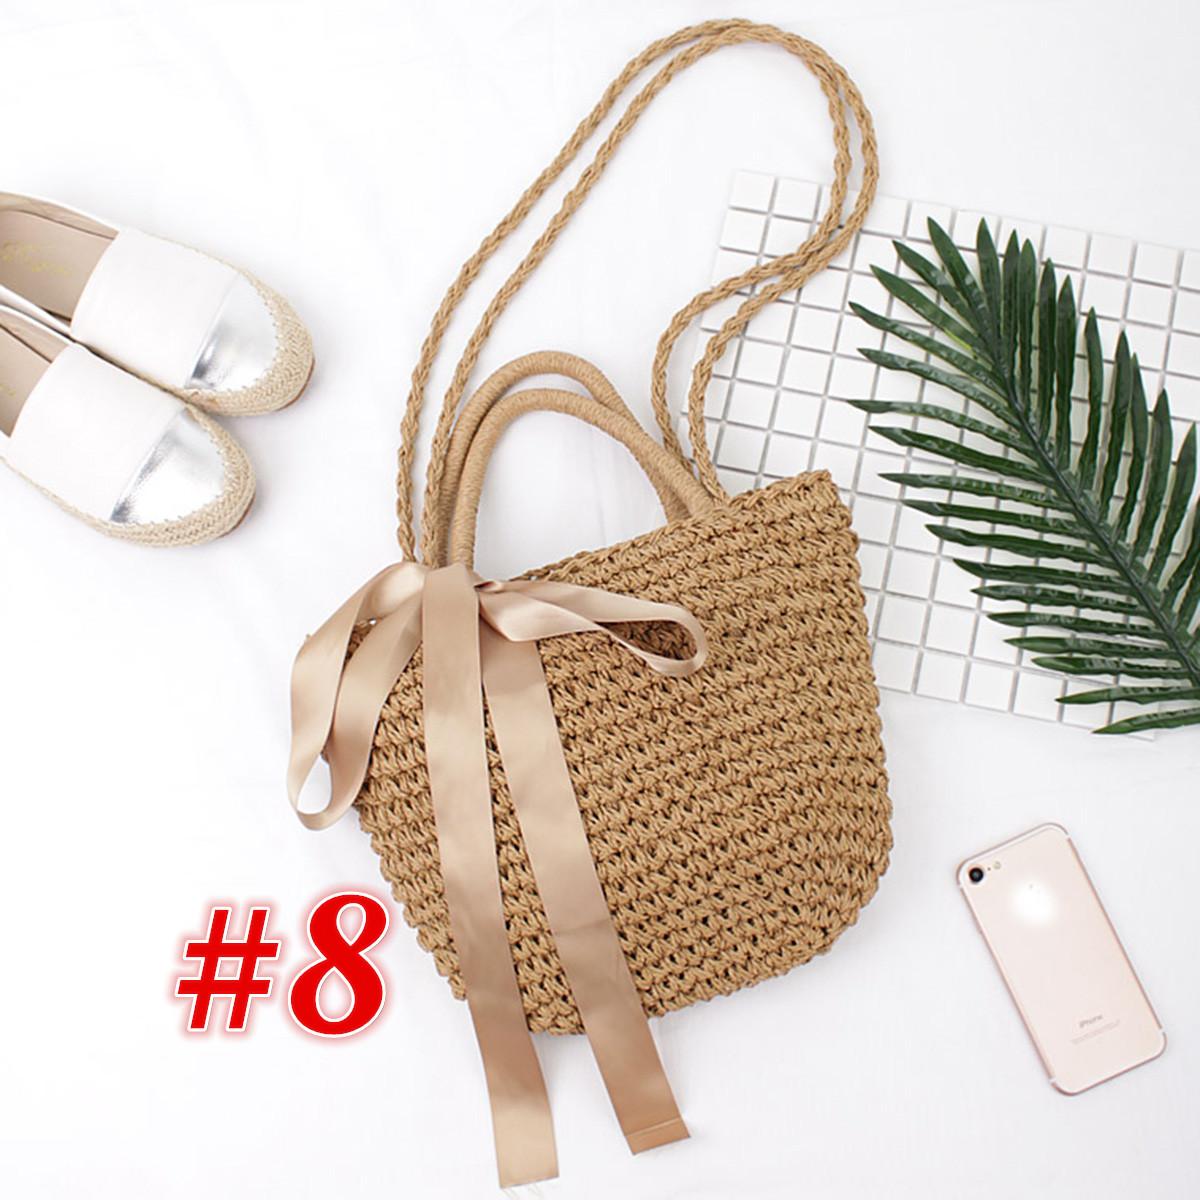 4052f8f29e Handmade Women Straw Rattan Beach Bag Crossbody Shoulder Handbag ...